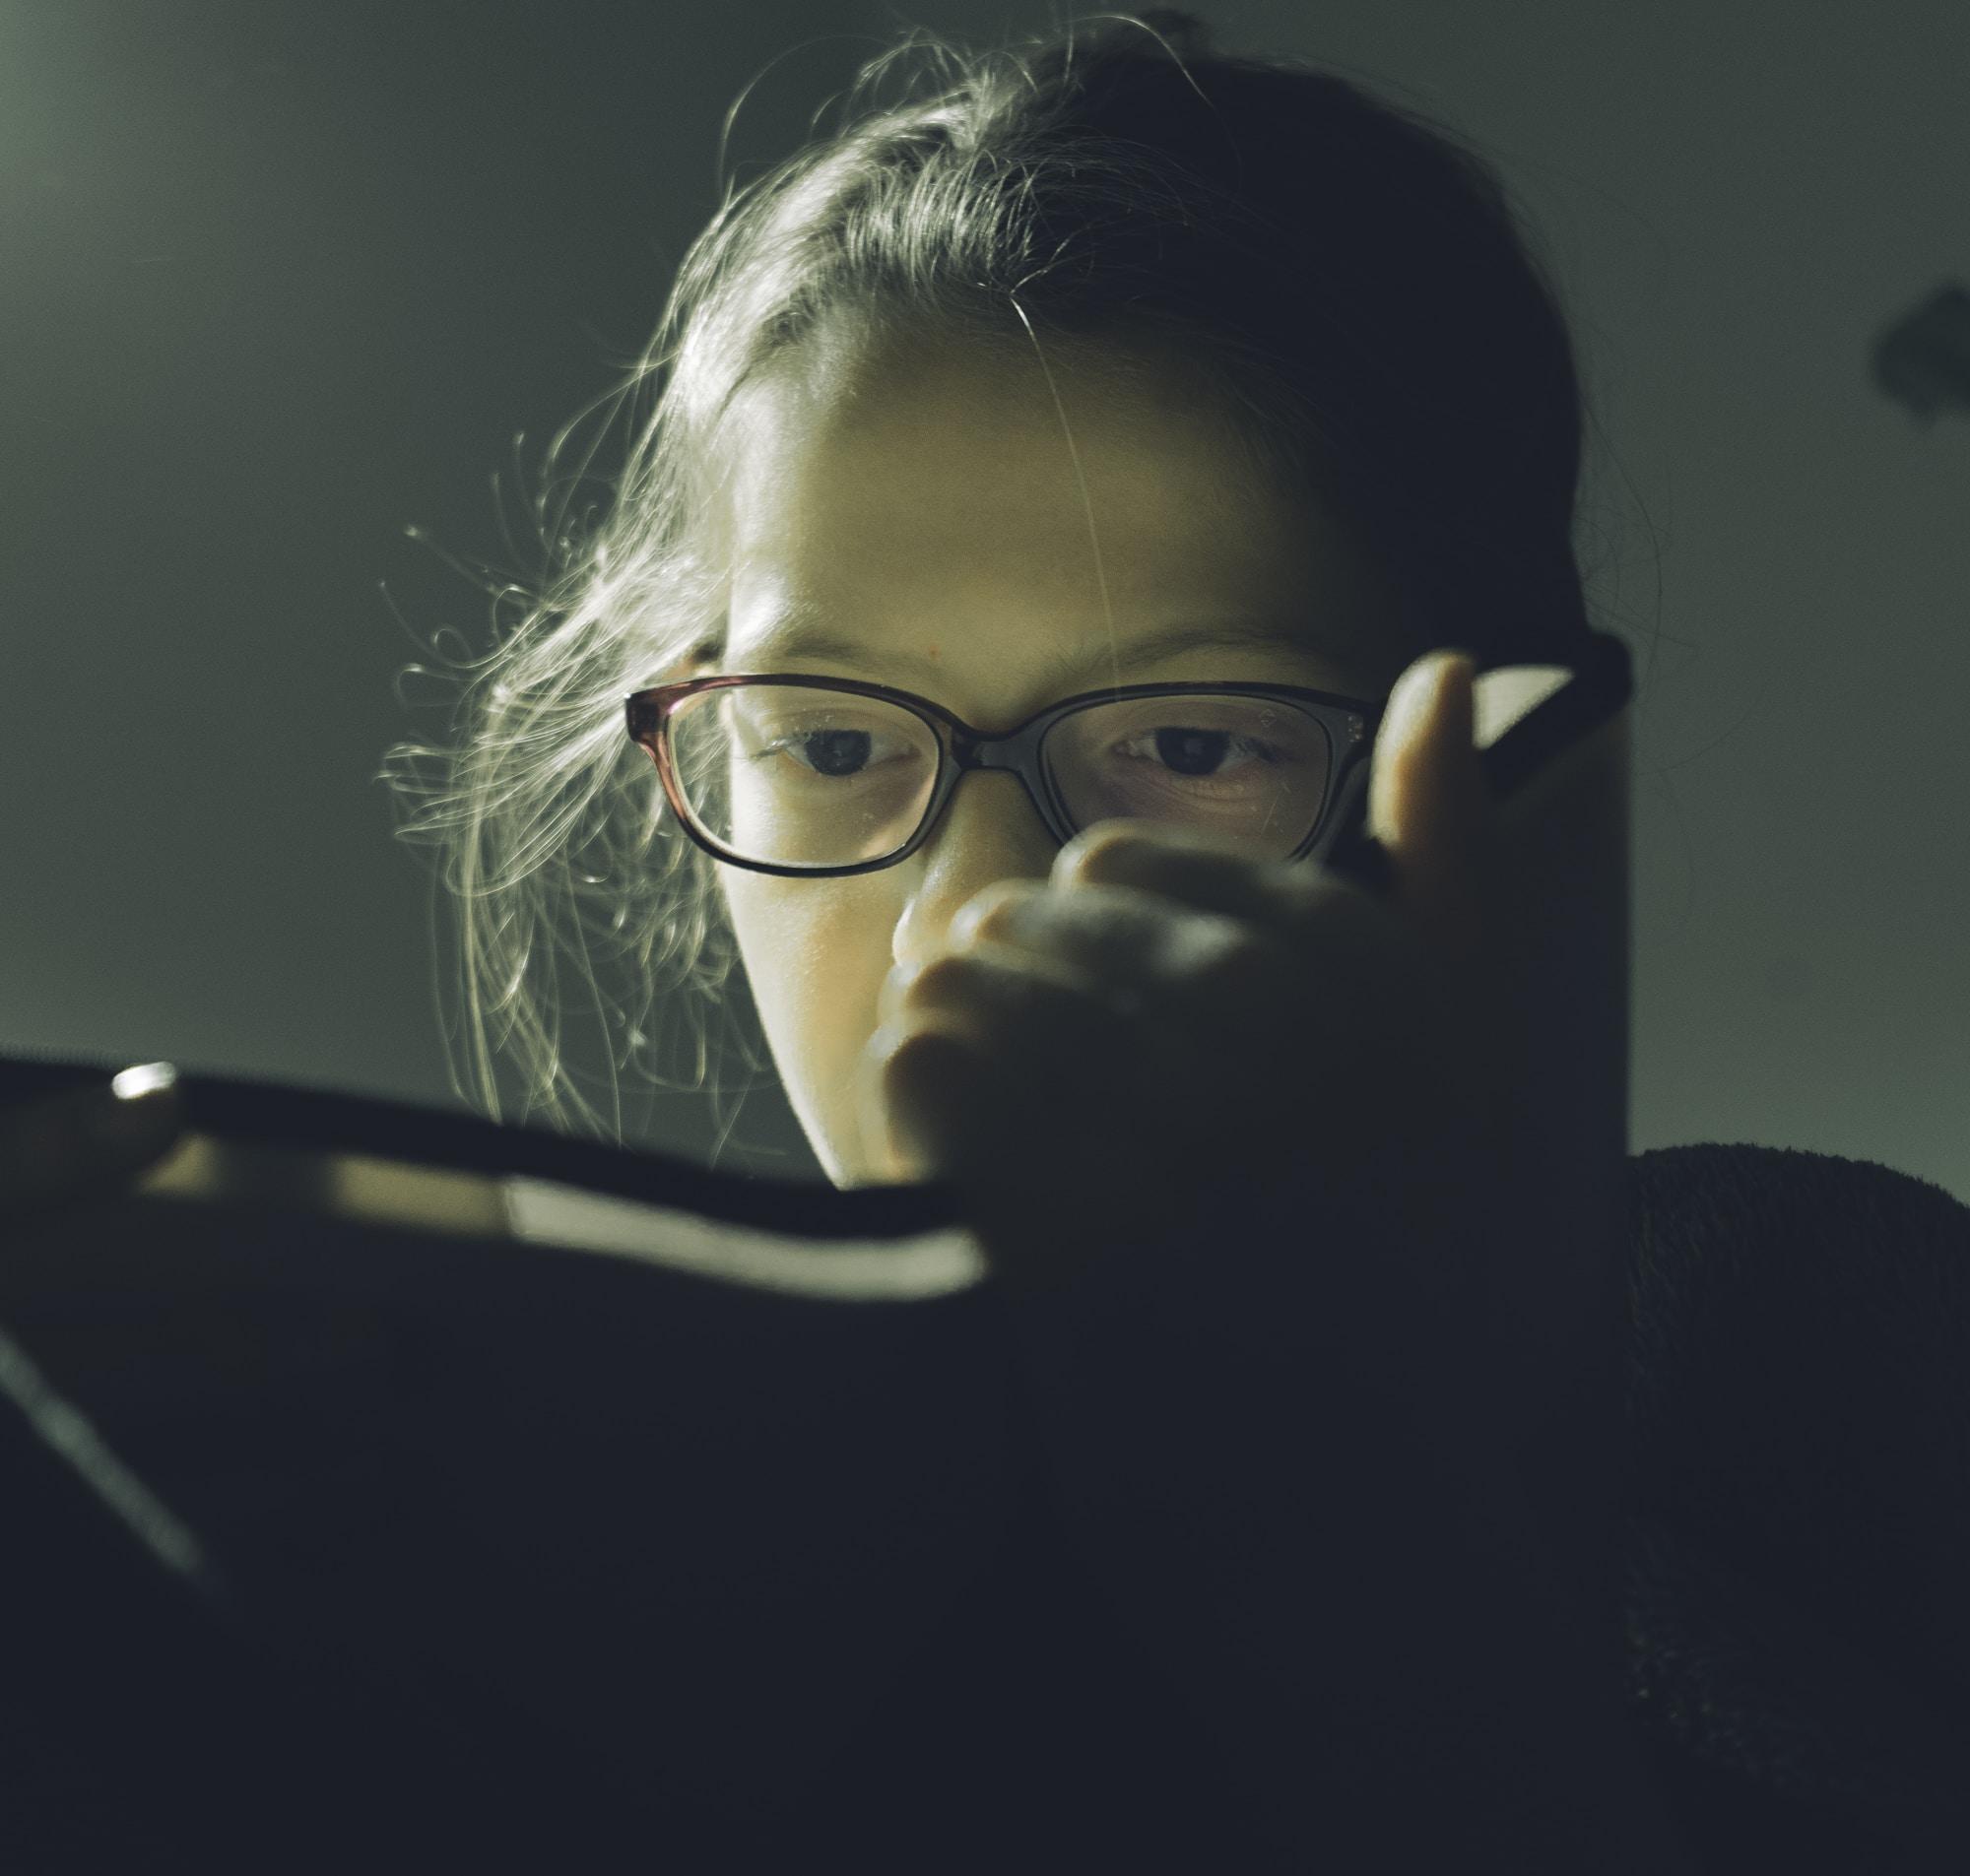 woman wearing eyeglasses reading book